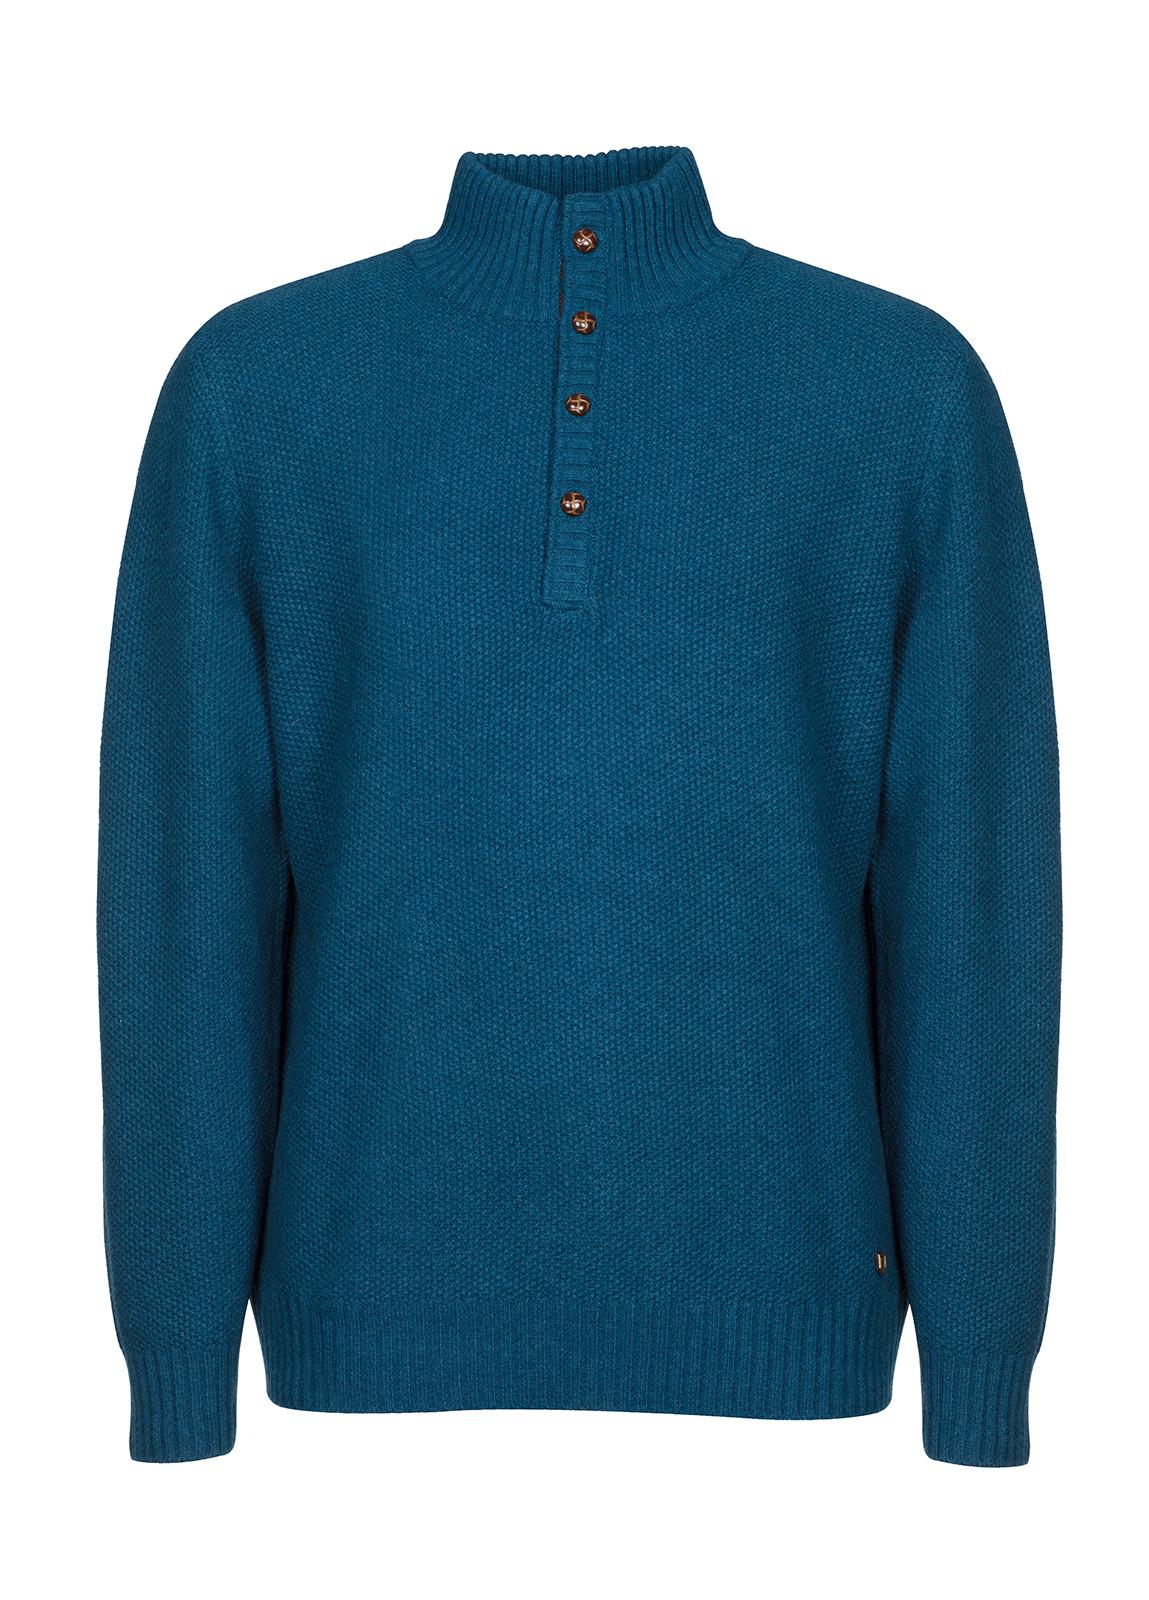 Dubarry_ Donohoe Sweater - Royal Blue_Image_2